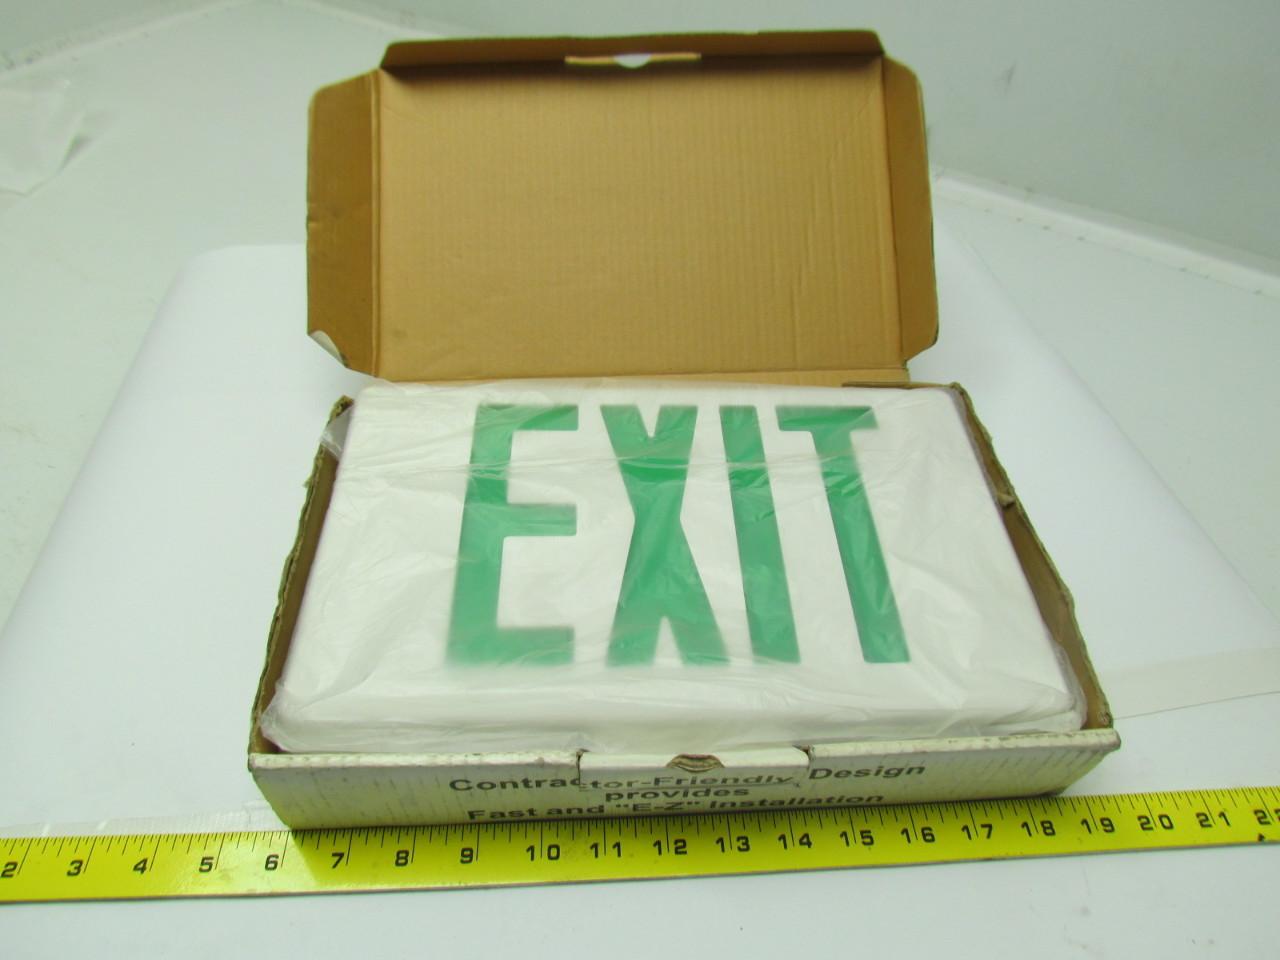 Best Lighting Ezxteu2gwem Led Exit Sign Green Letters